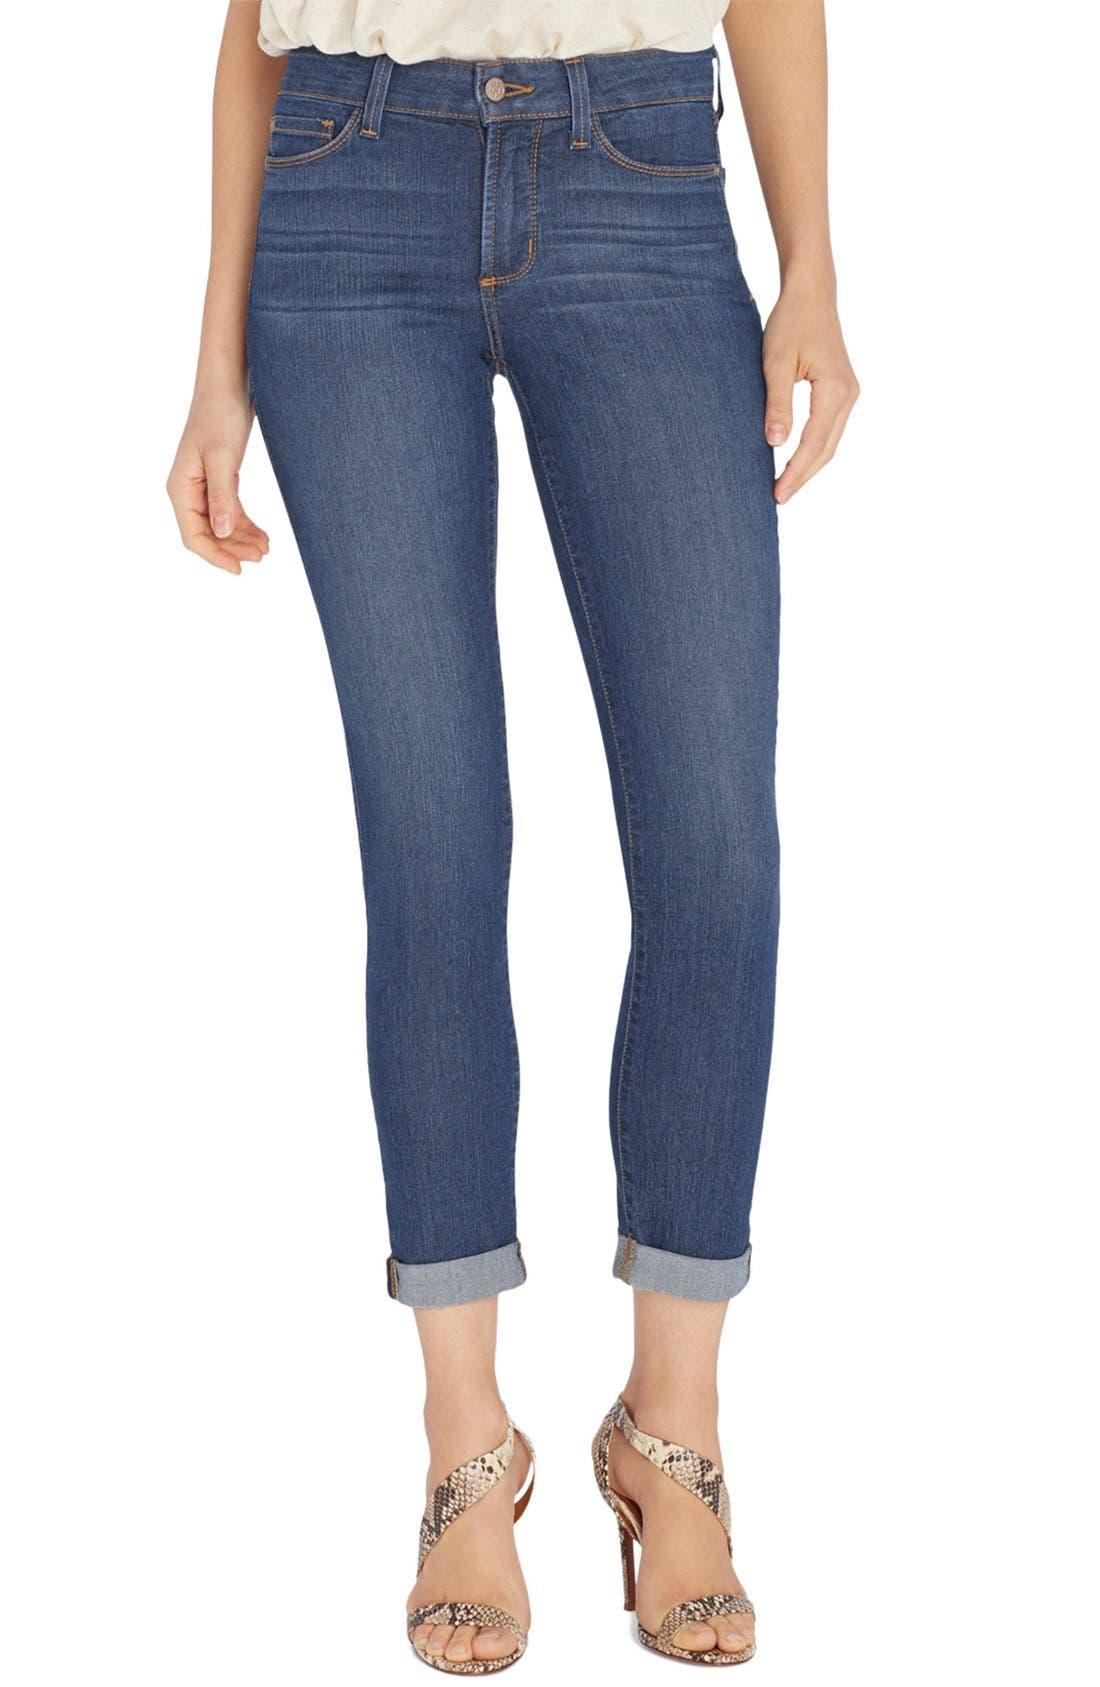 'Annabelle' Stretch Boyfriend Jeans,                         Main,                         color, 401